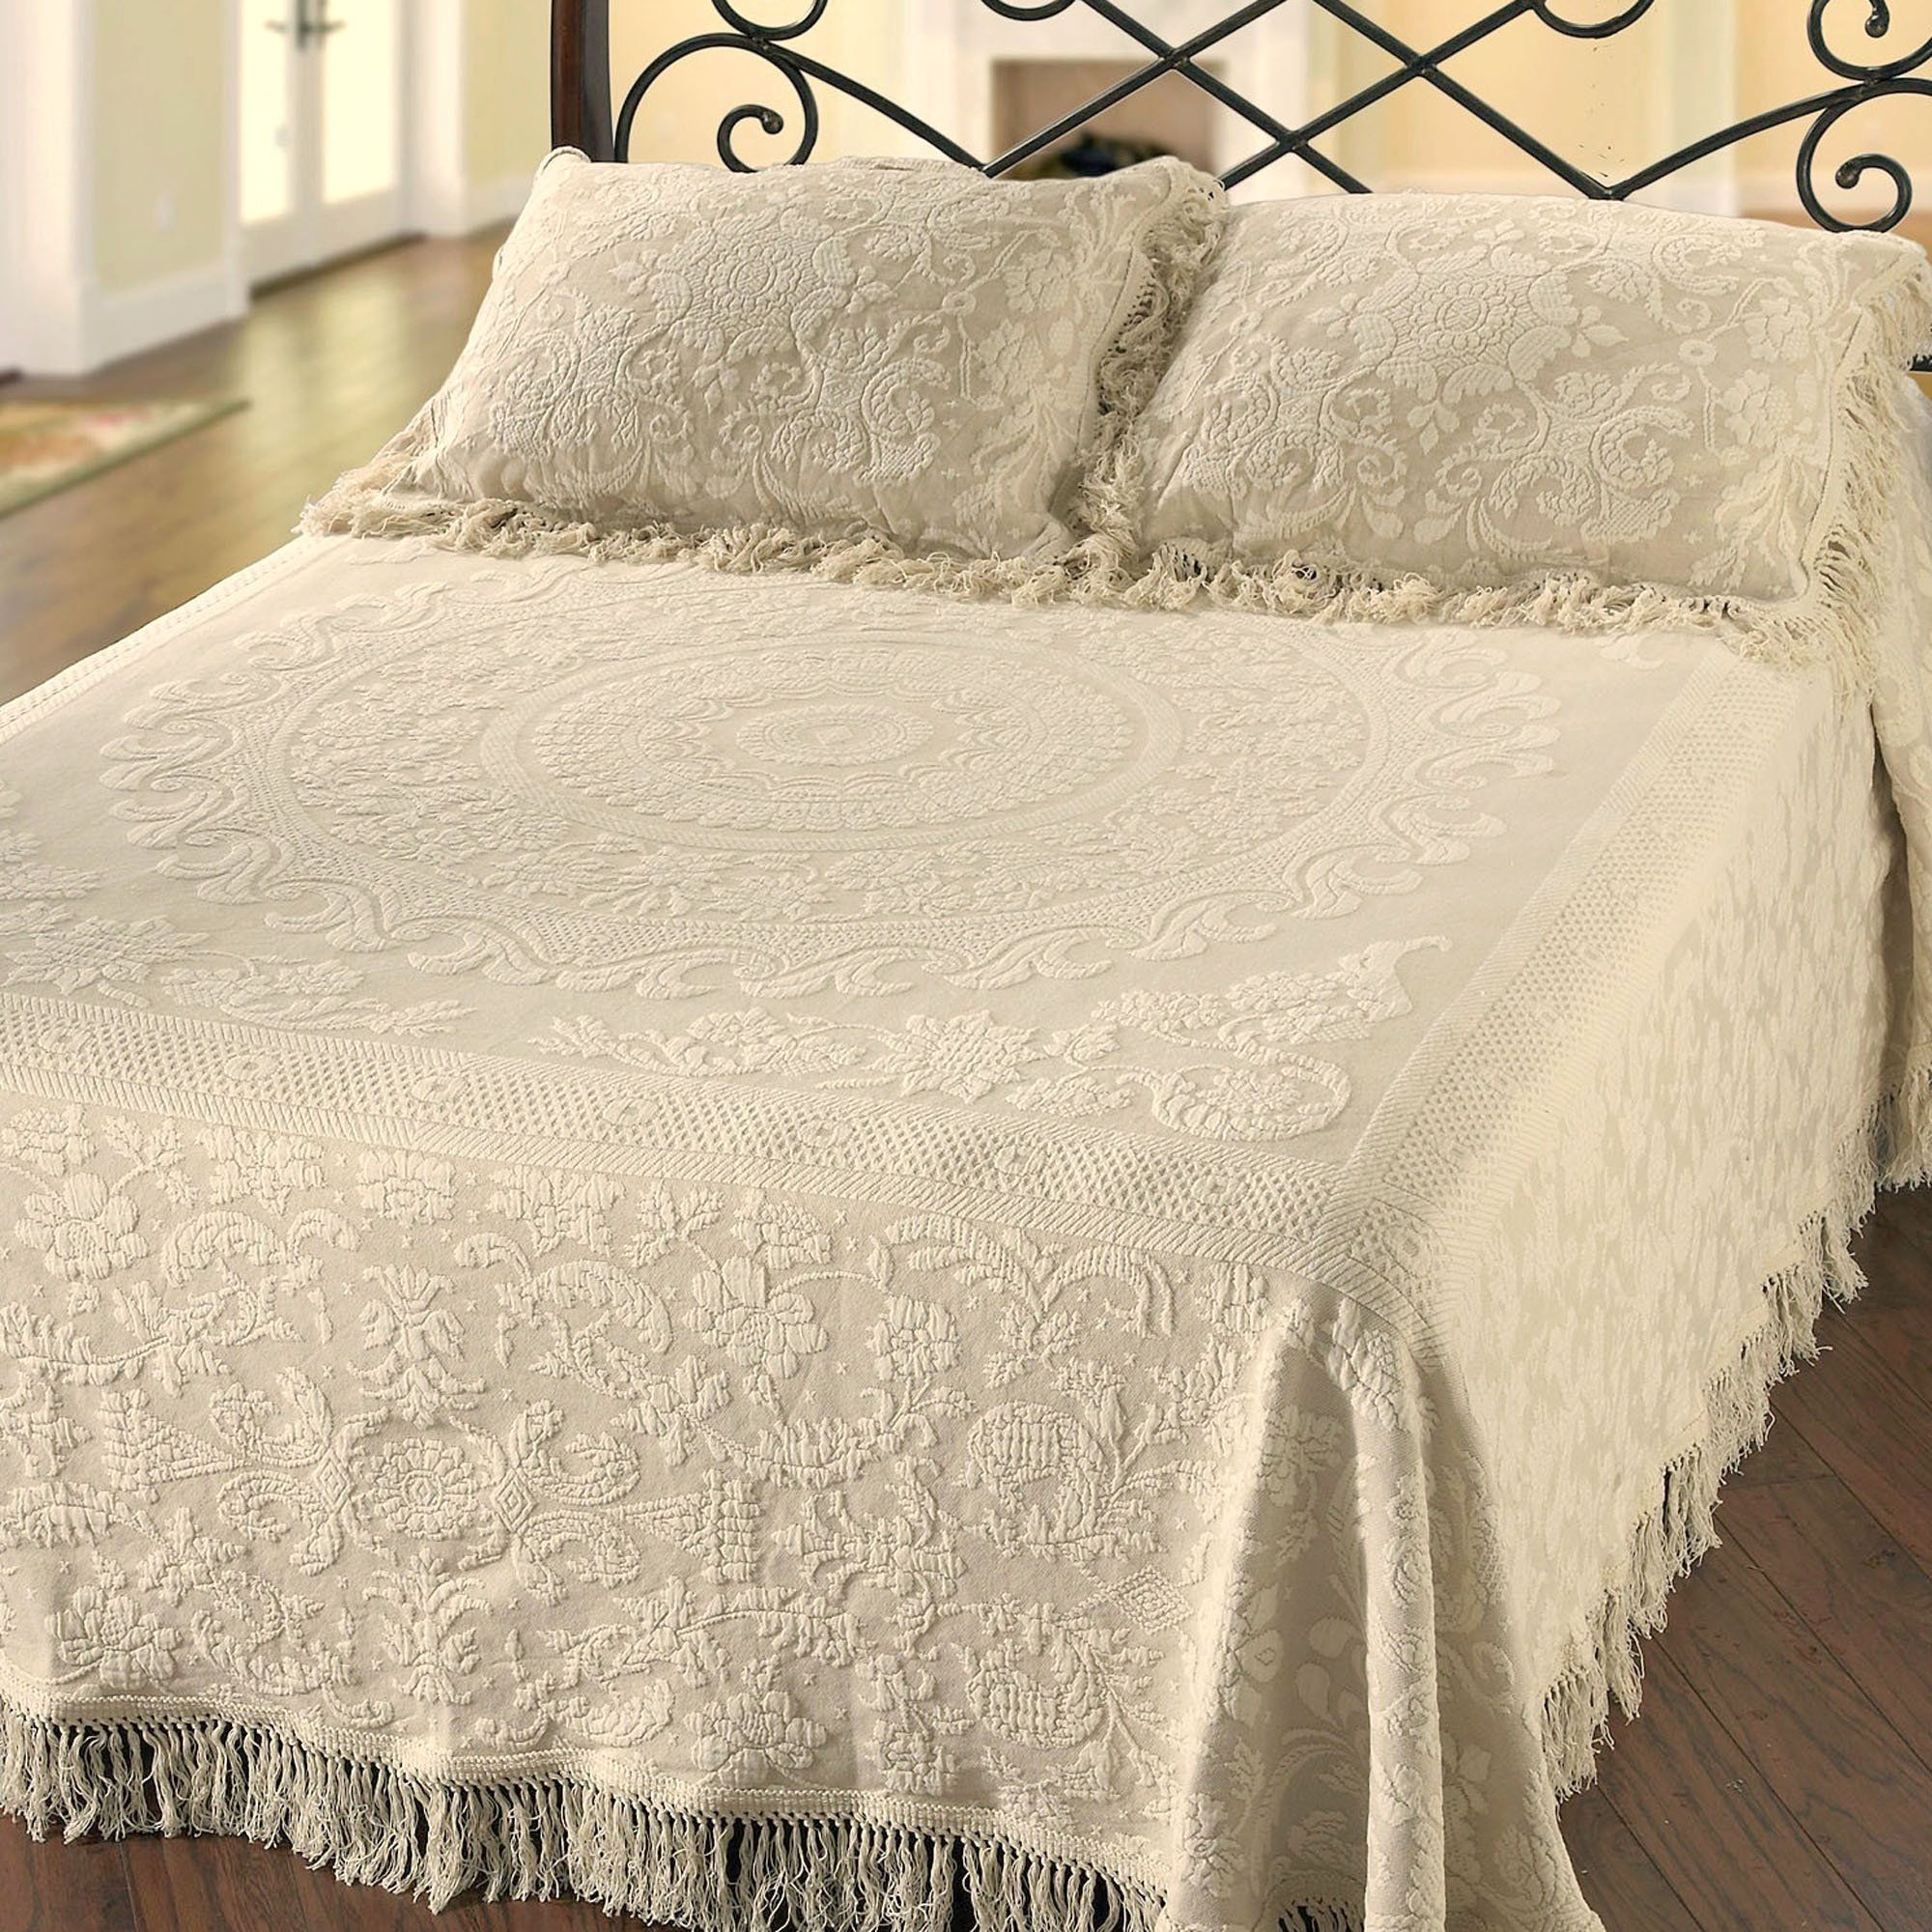 Bedspread design ideas - Queen Elizabeth R Woven Matelasse Bedspread Bedding